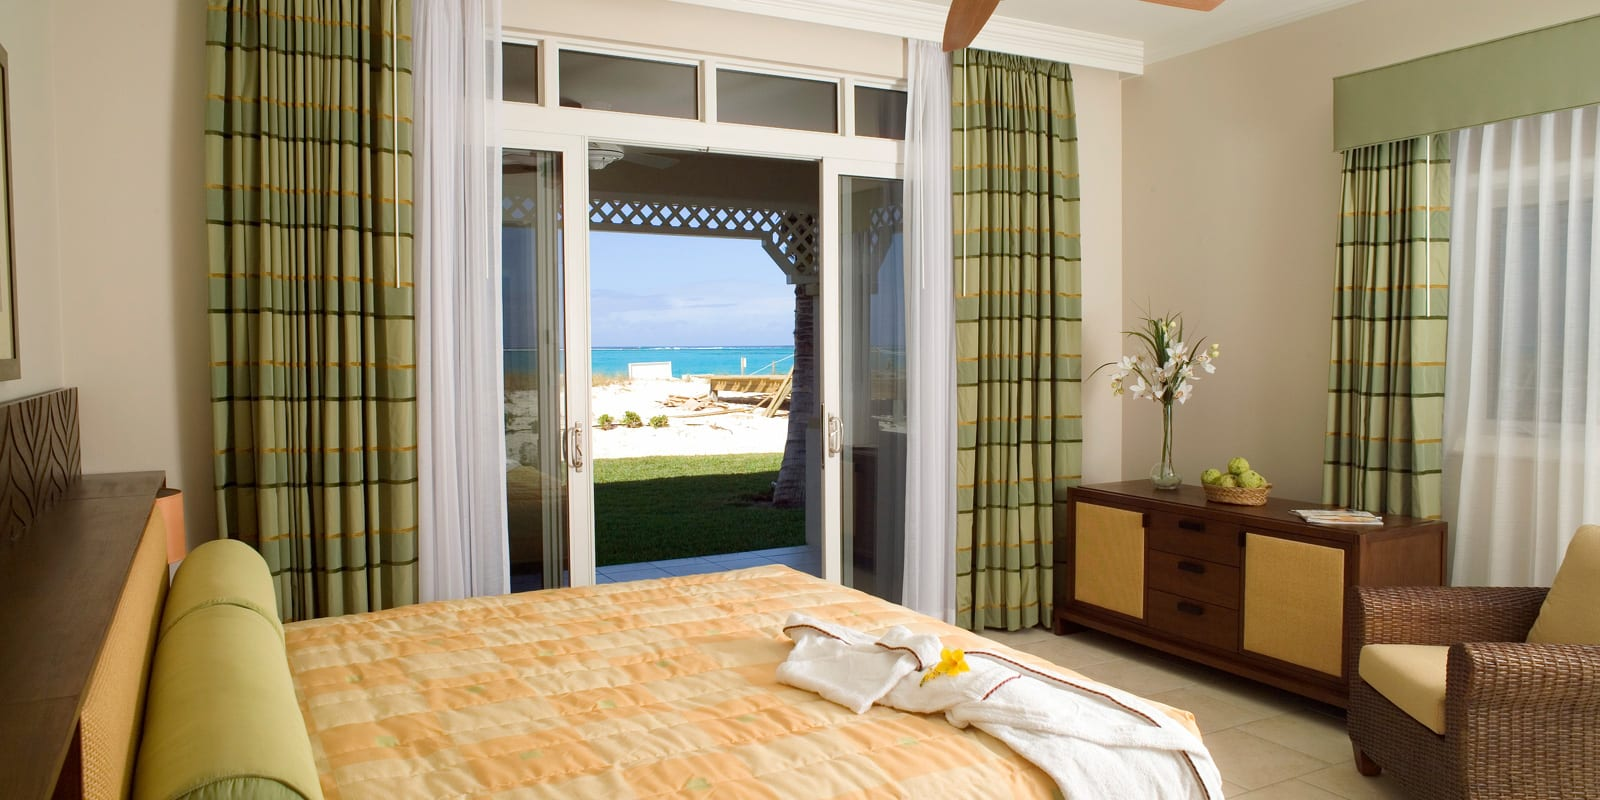 Alexandra Resort Product Shots